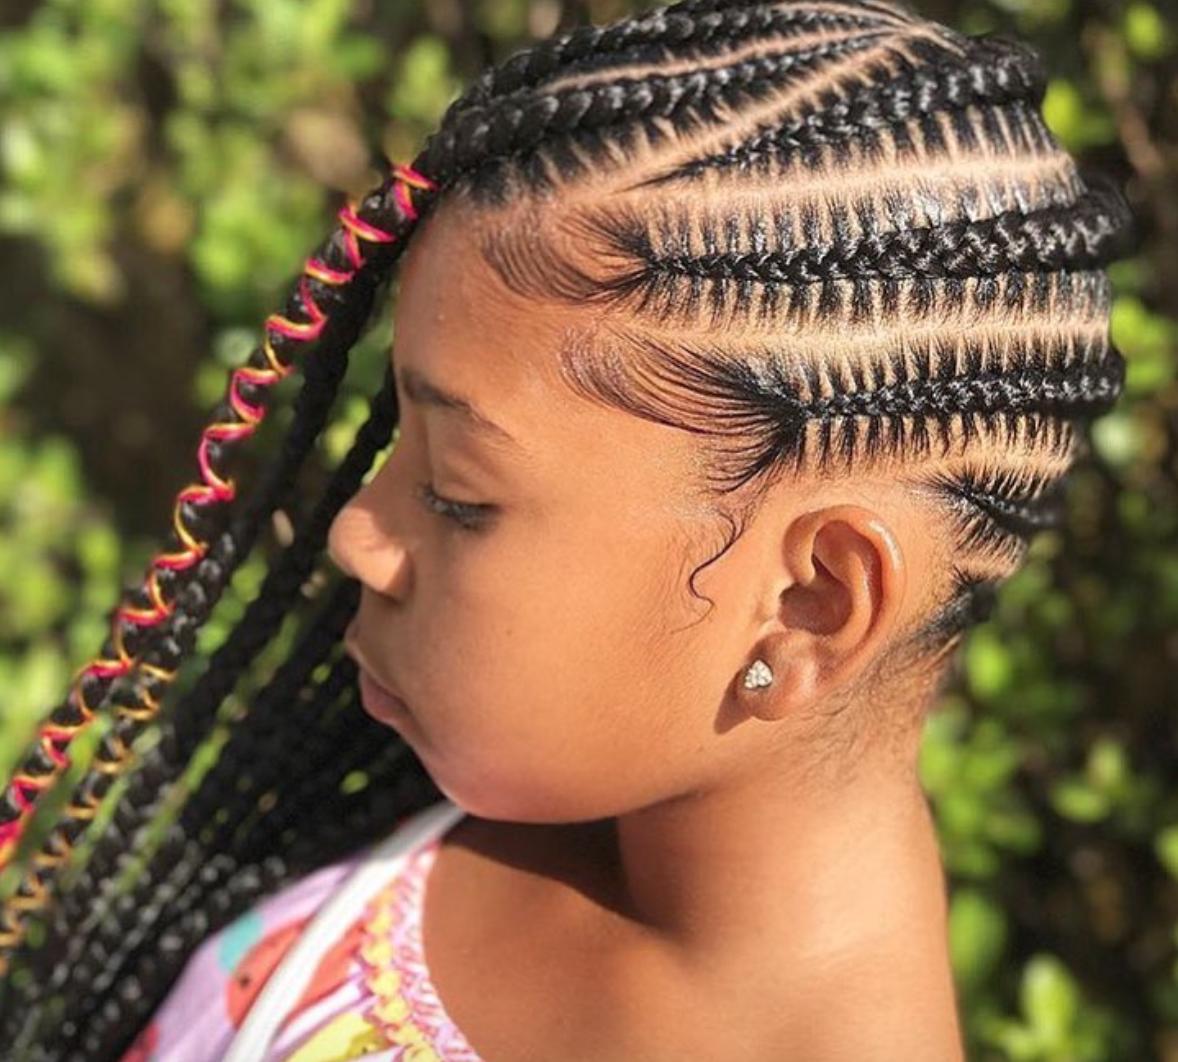 Pin by louwrinda ndjiharine on hairstyles in pinterest hair